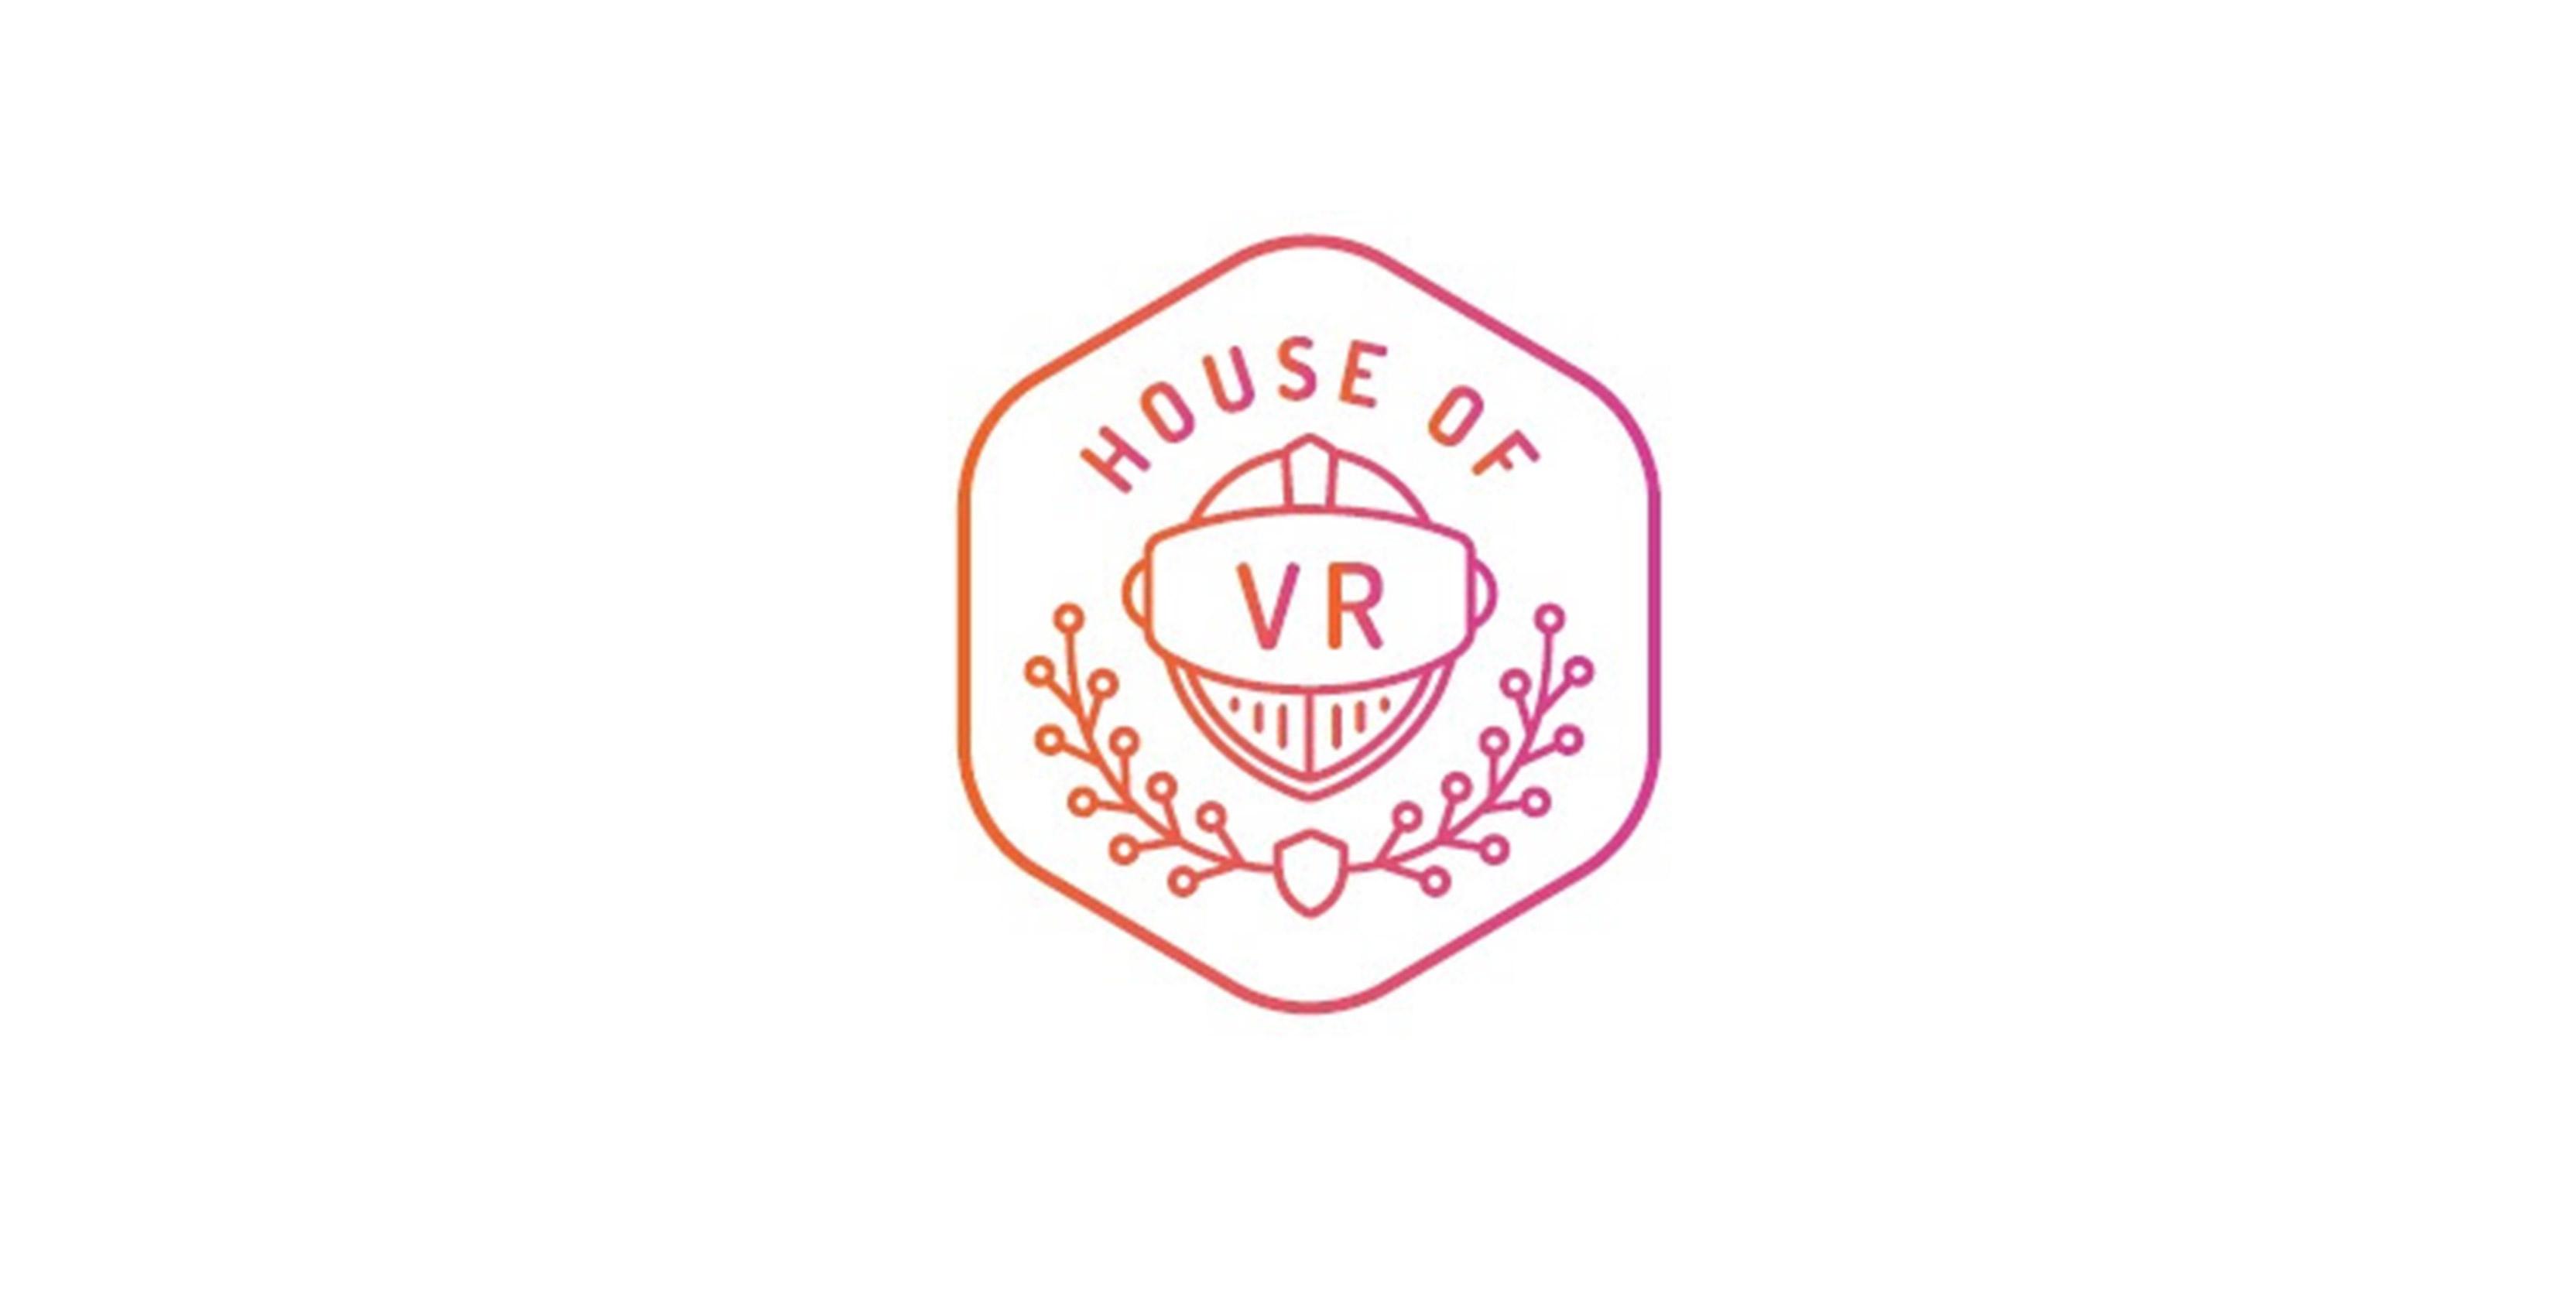 house of vr toronto